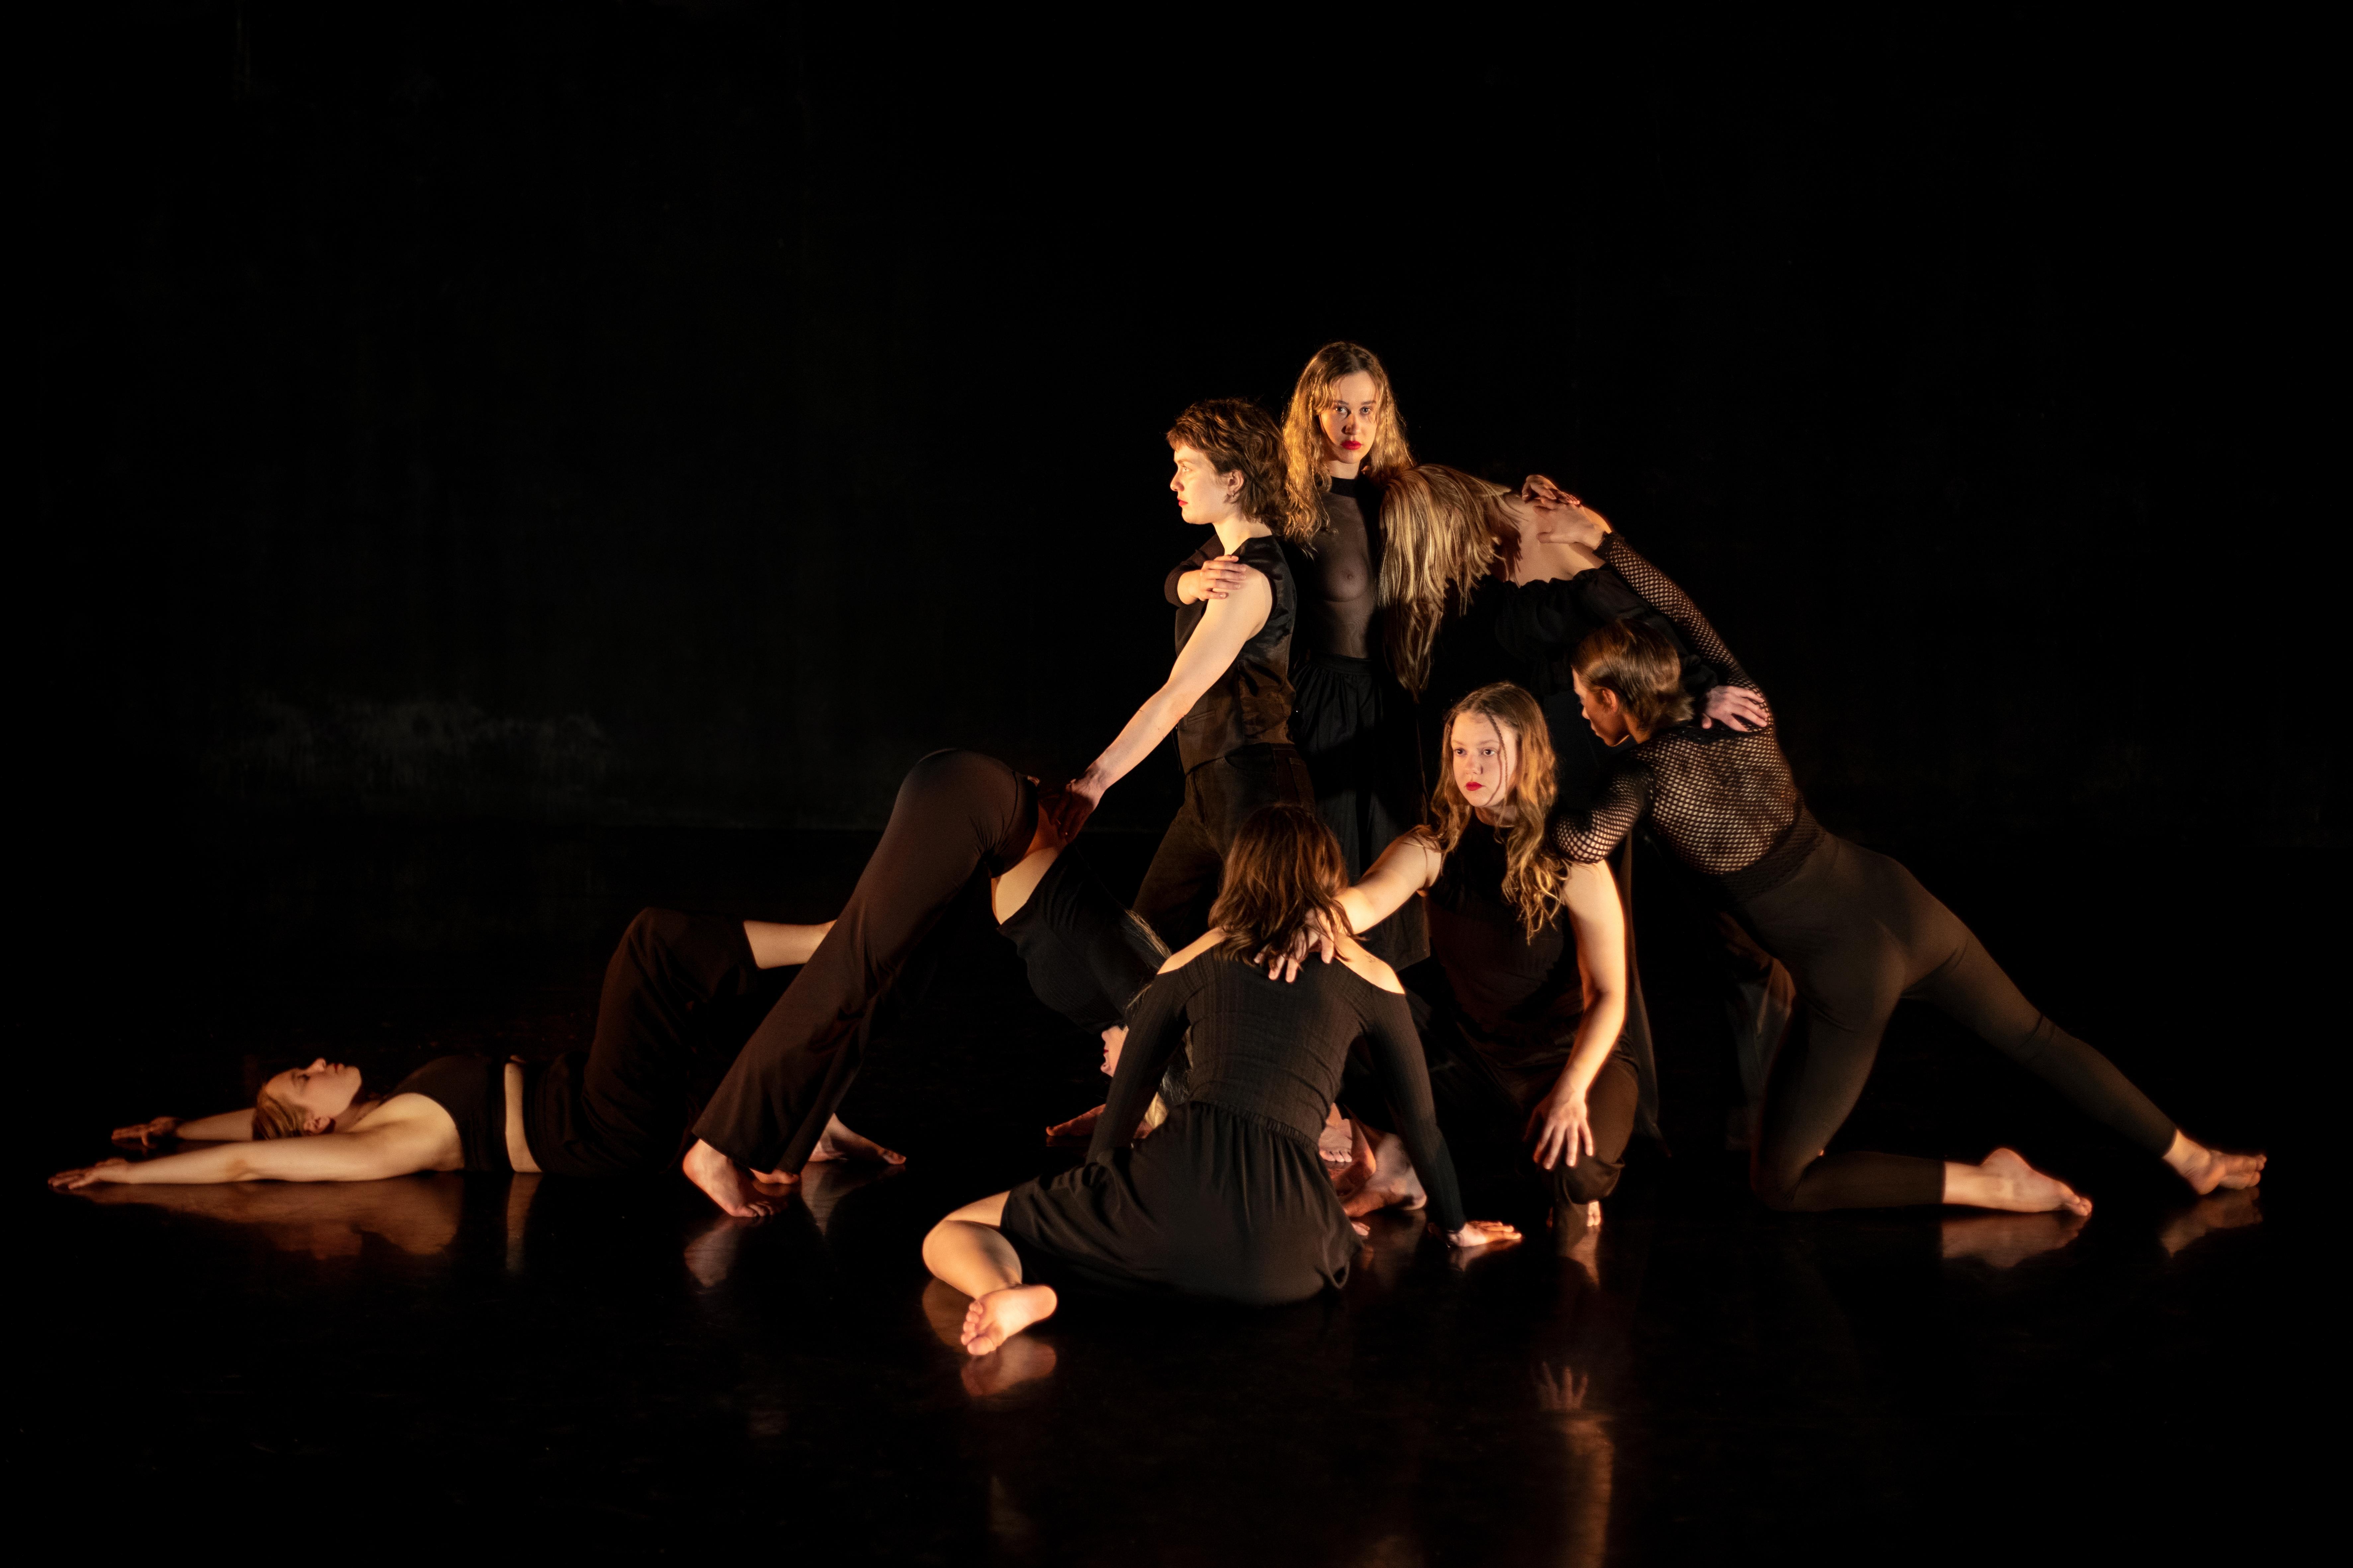 performance_anna_kolfinna_antjetaiga2.jpg